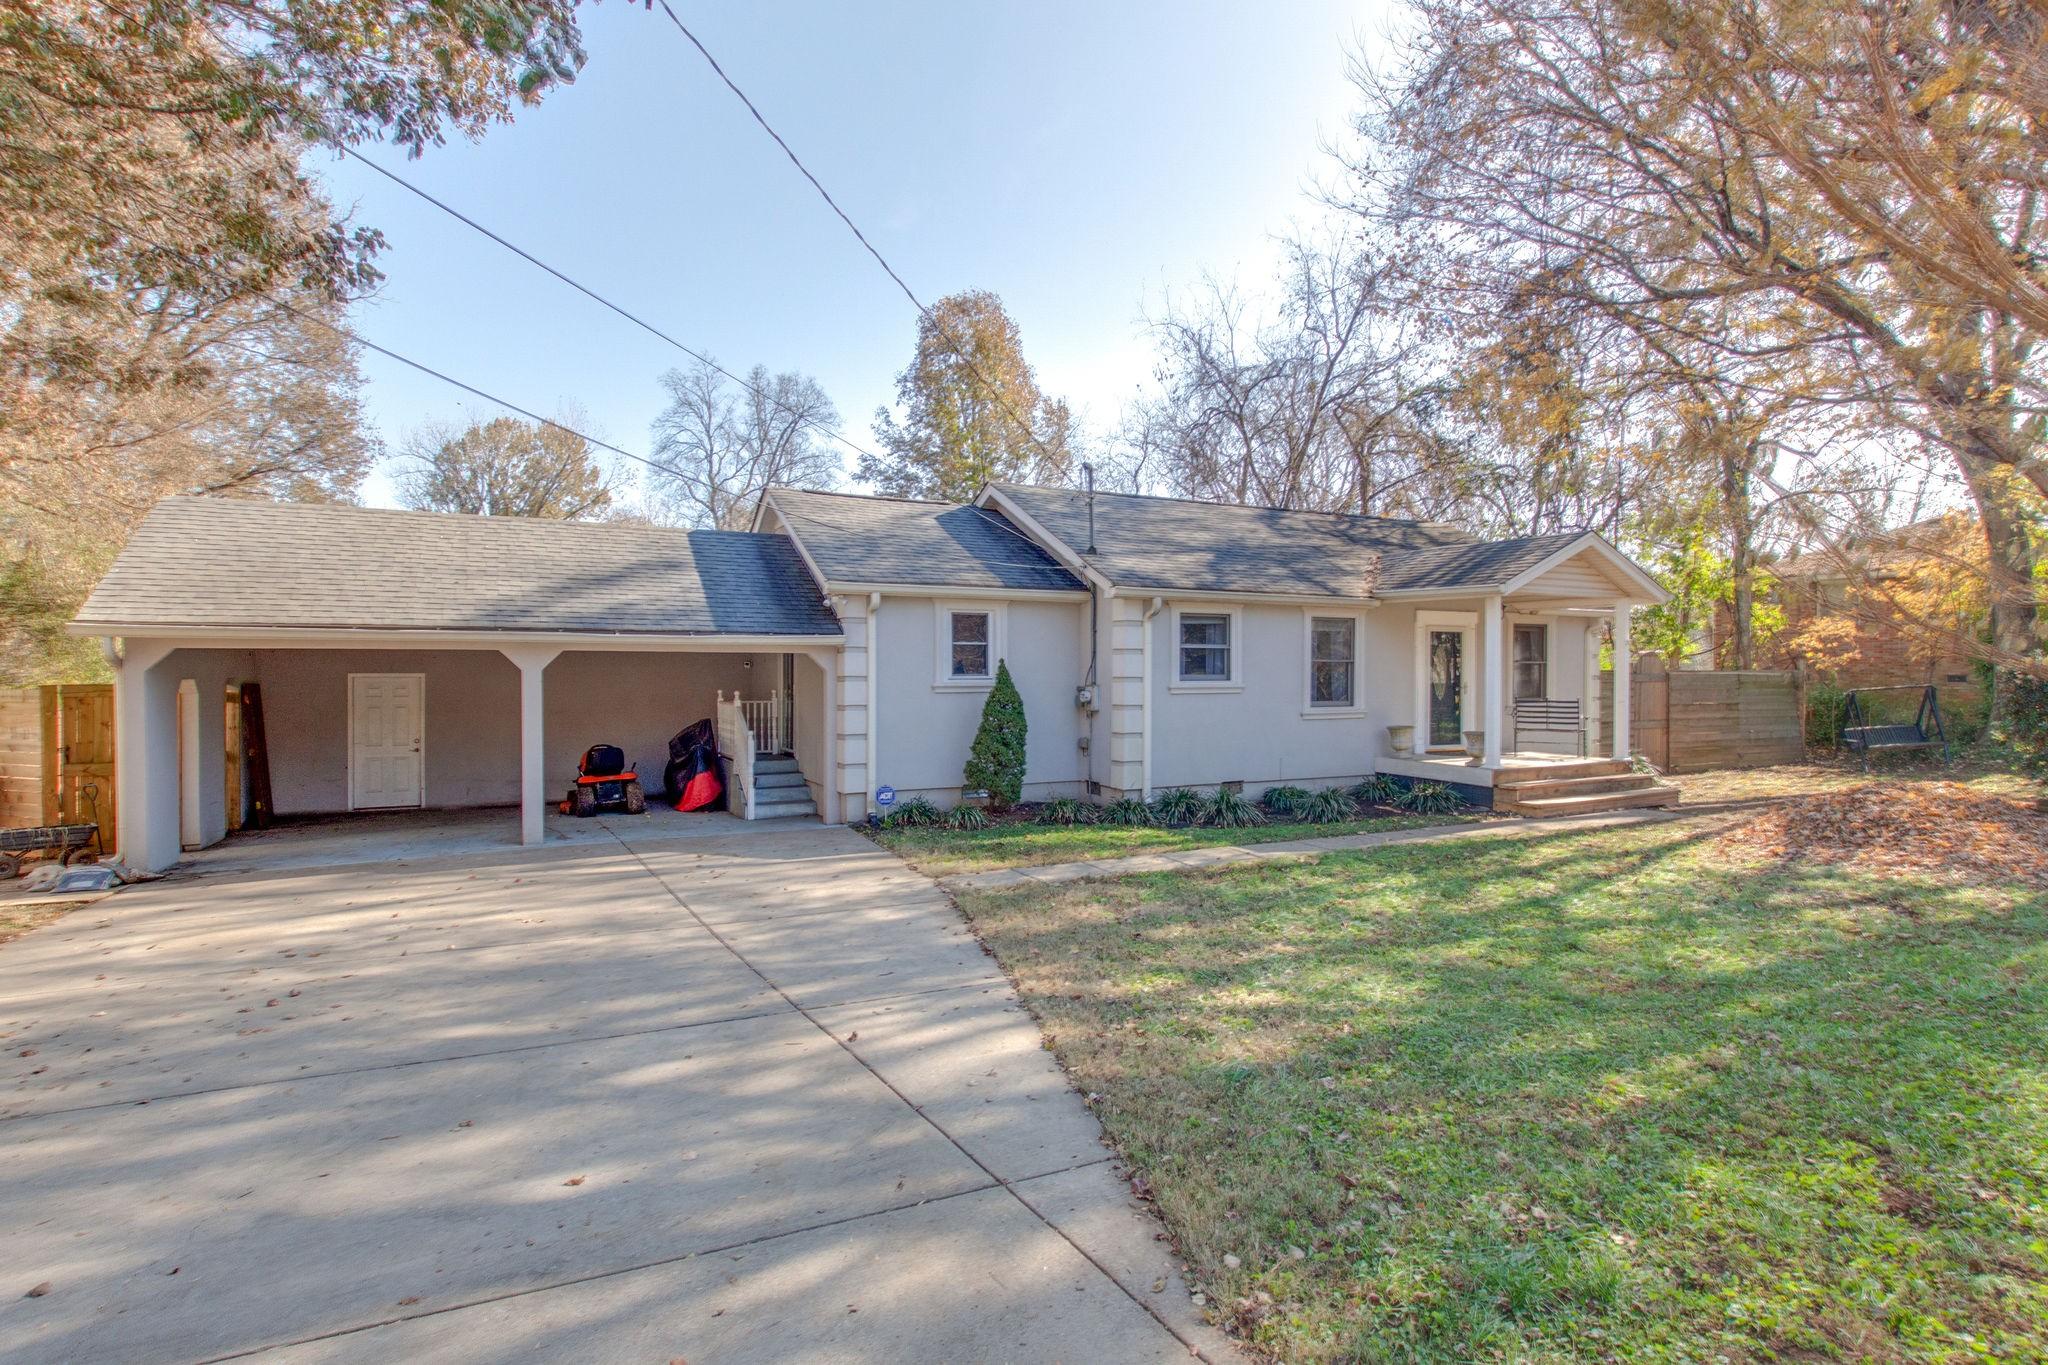 934 Drummond Dr, Nashville, TN 37211 - Nashville, TN real estate listing